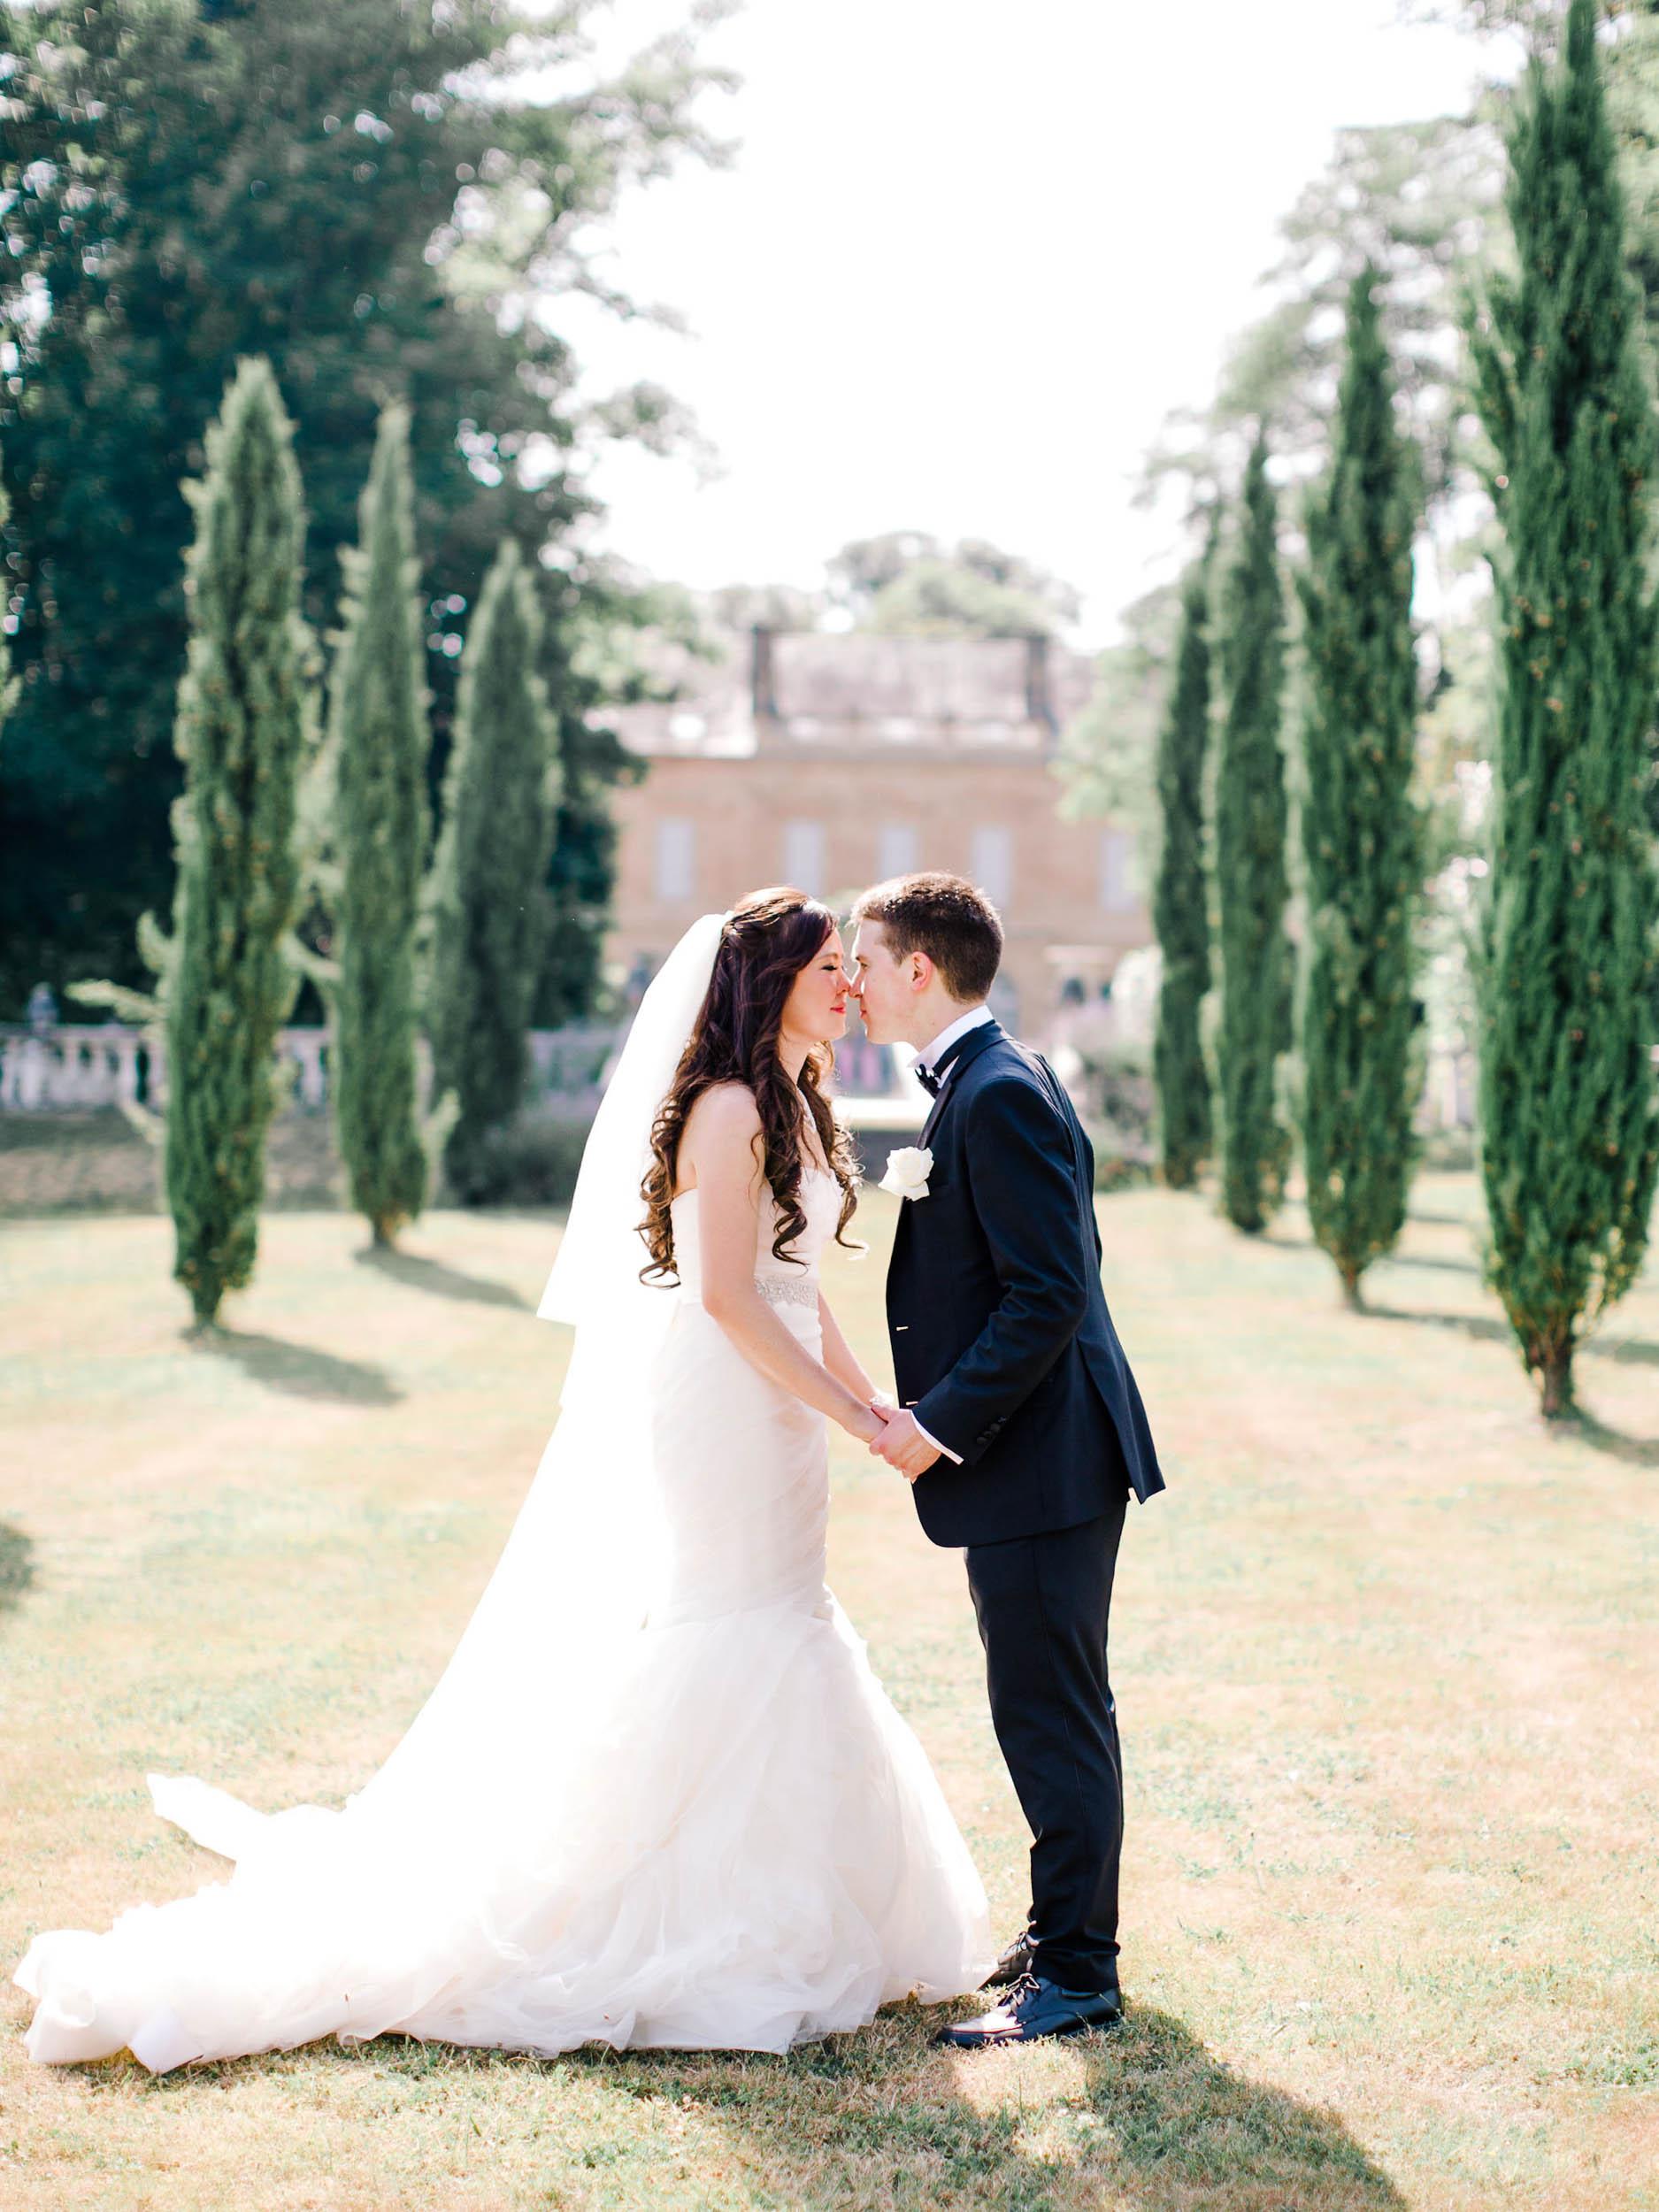 Amy O'Boyle Photography- Destination & UK Fine Art Film Wedding Photographer- Chateau La Durantie Wedding-41.jpg